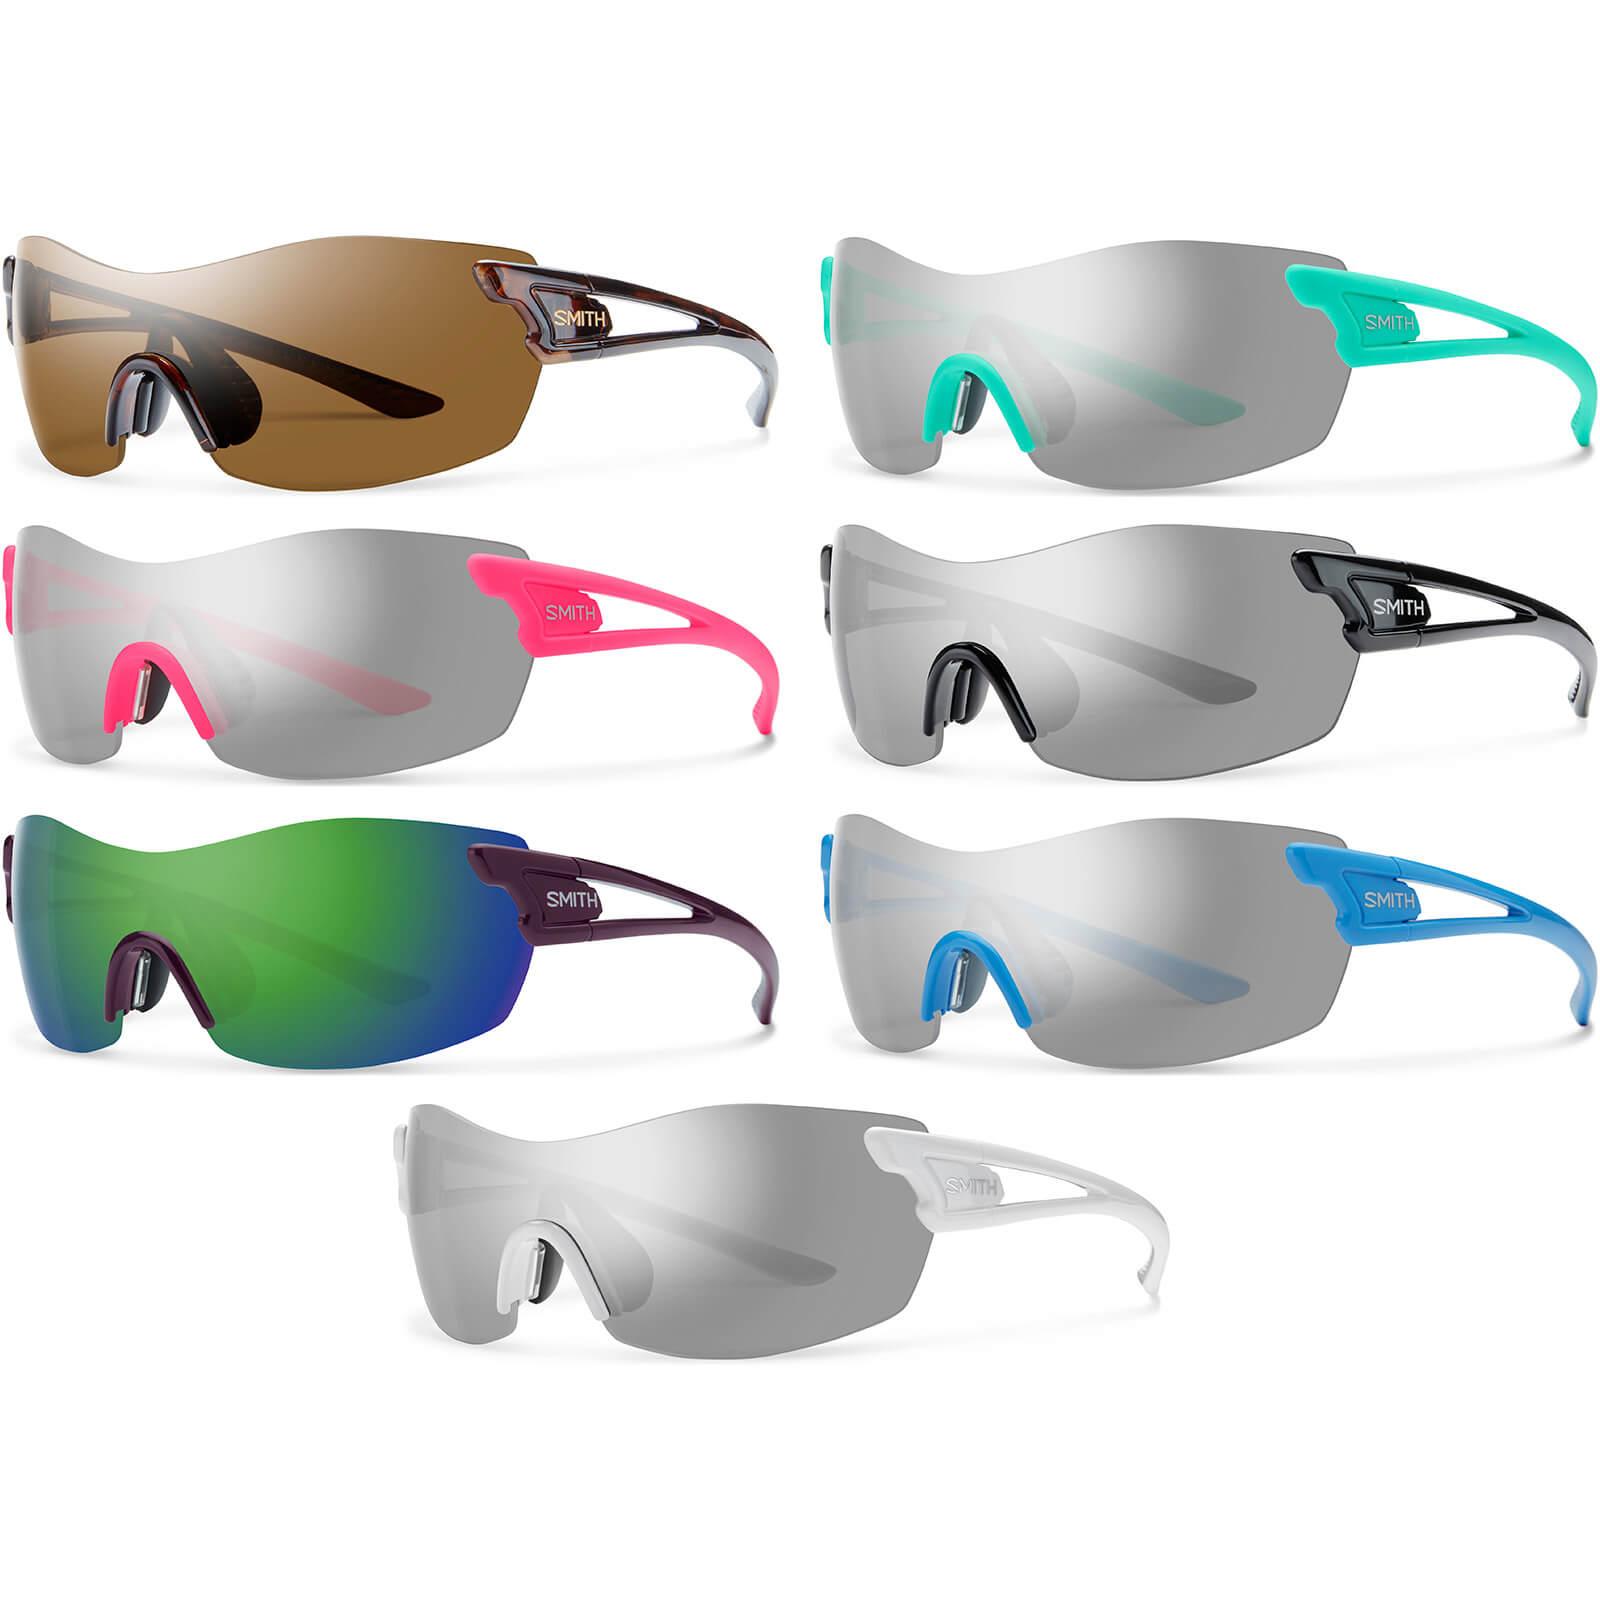 389a6bdcf9 Smith Pivlock Asana ChromaPop Sunglasses